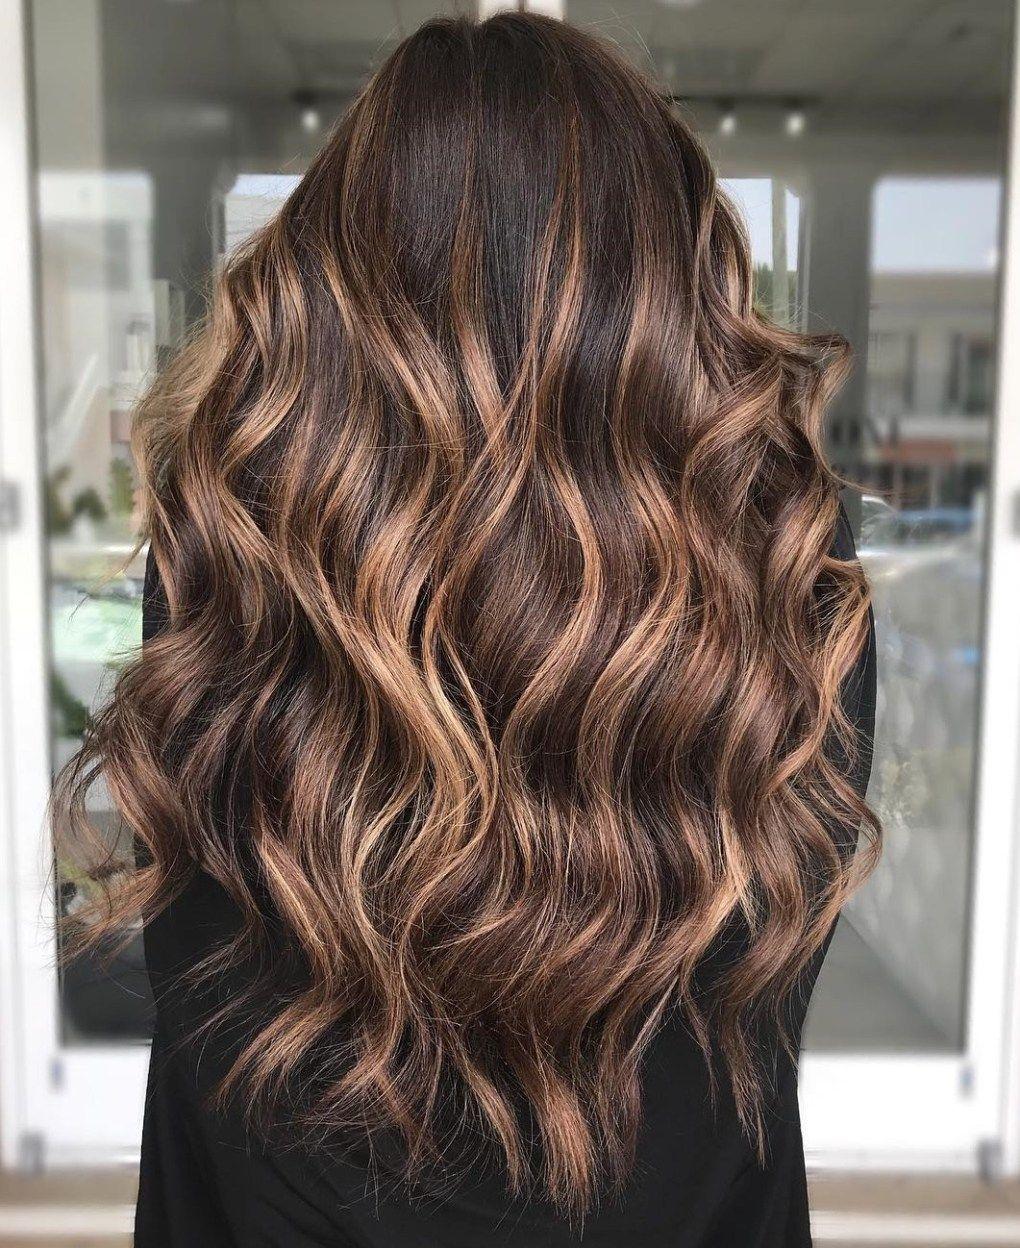 50 Dark Brown Hair With Highlights Ideas For 2019 Hair Adviser Highlights Brown Hair Balayage Hair Highlights Golden Highlights Brown Hair